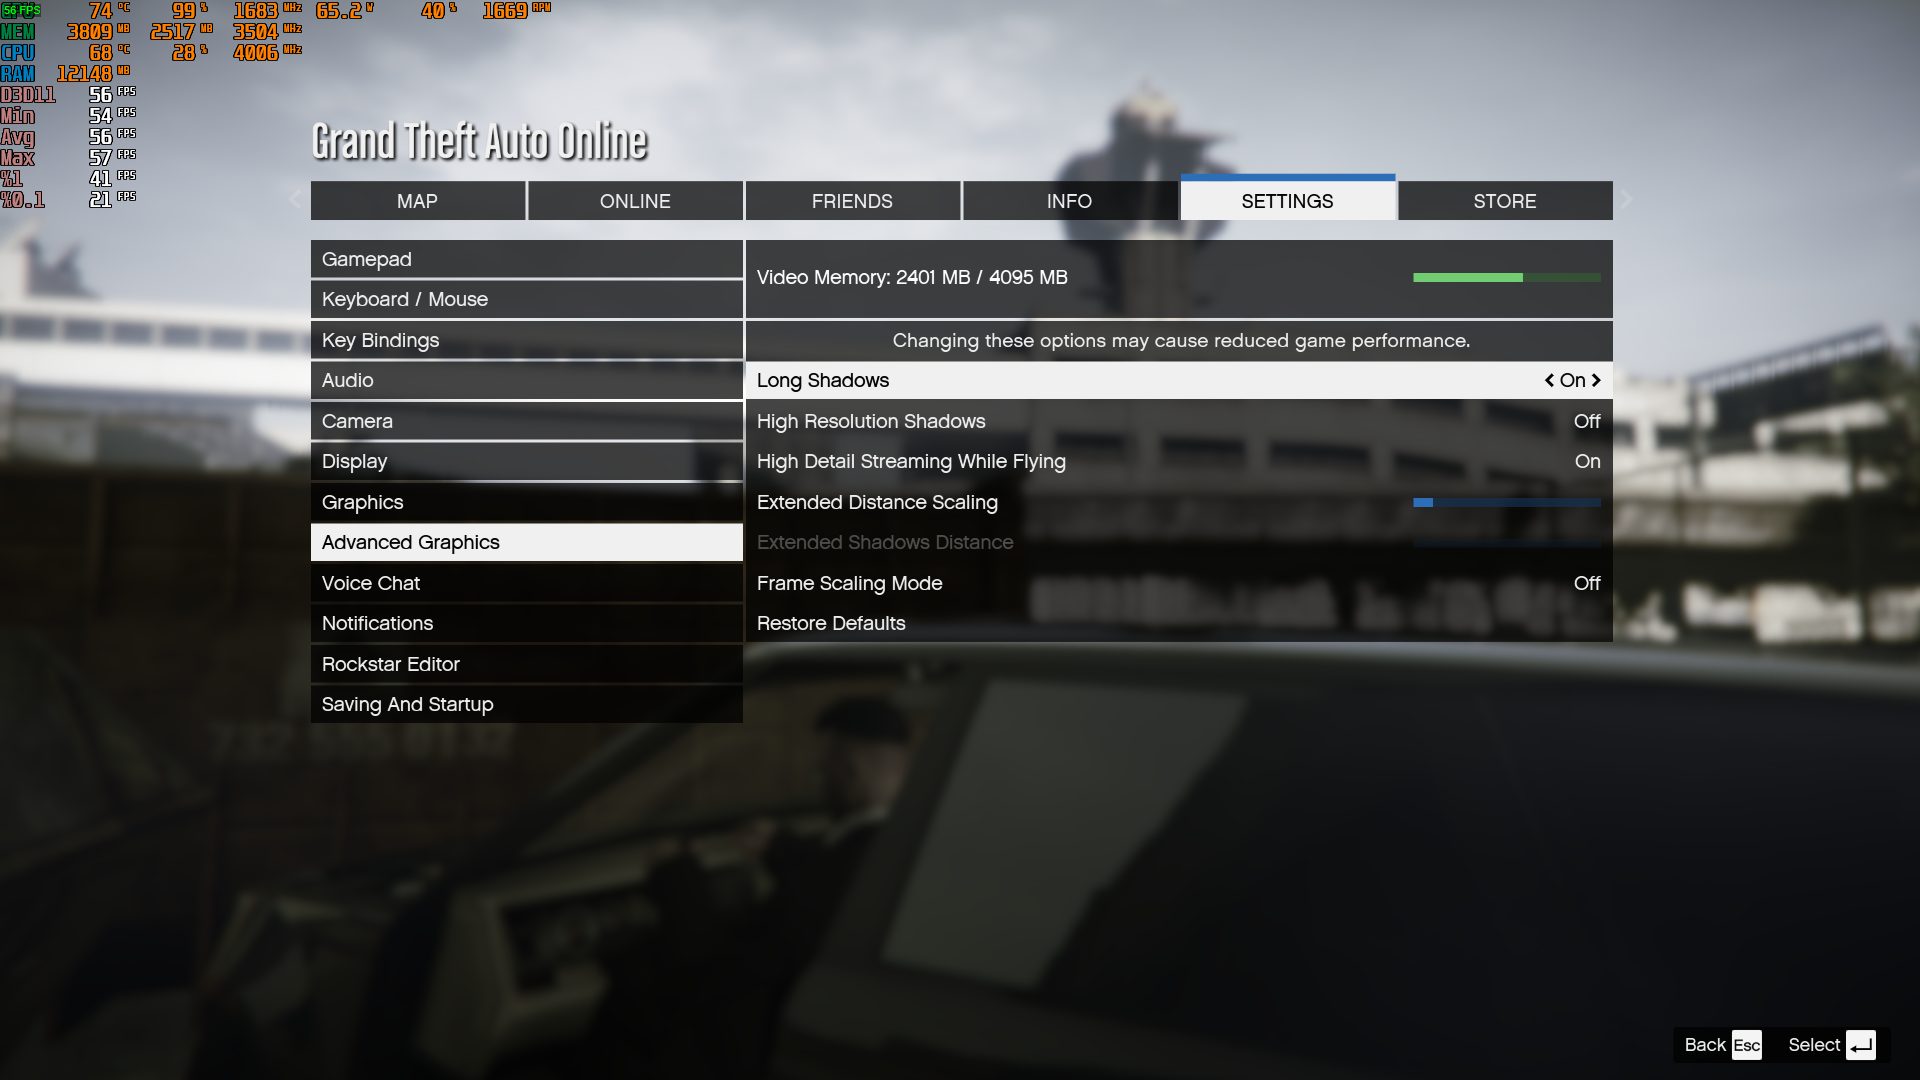 Grand Theft Auto V Screenshot 2021.05.06 - 14.29.45.83.png